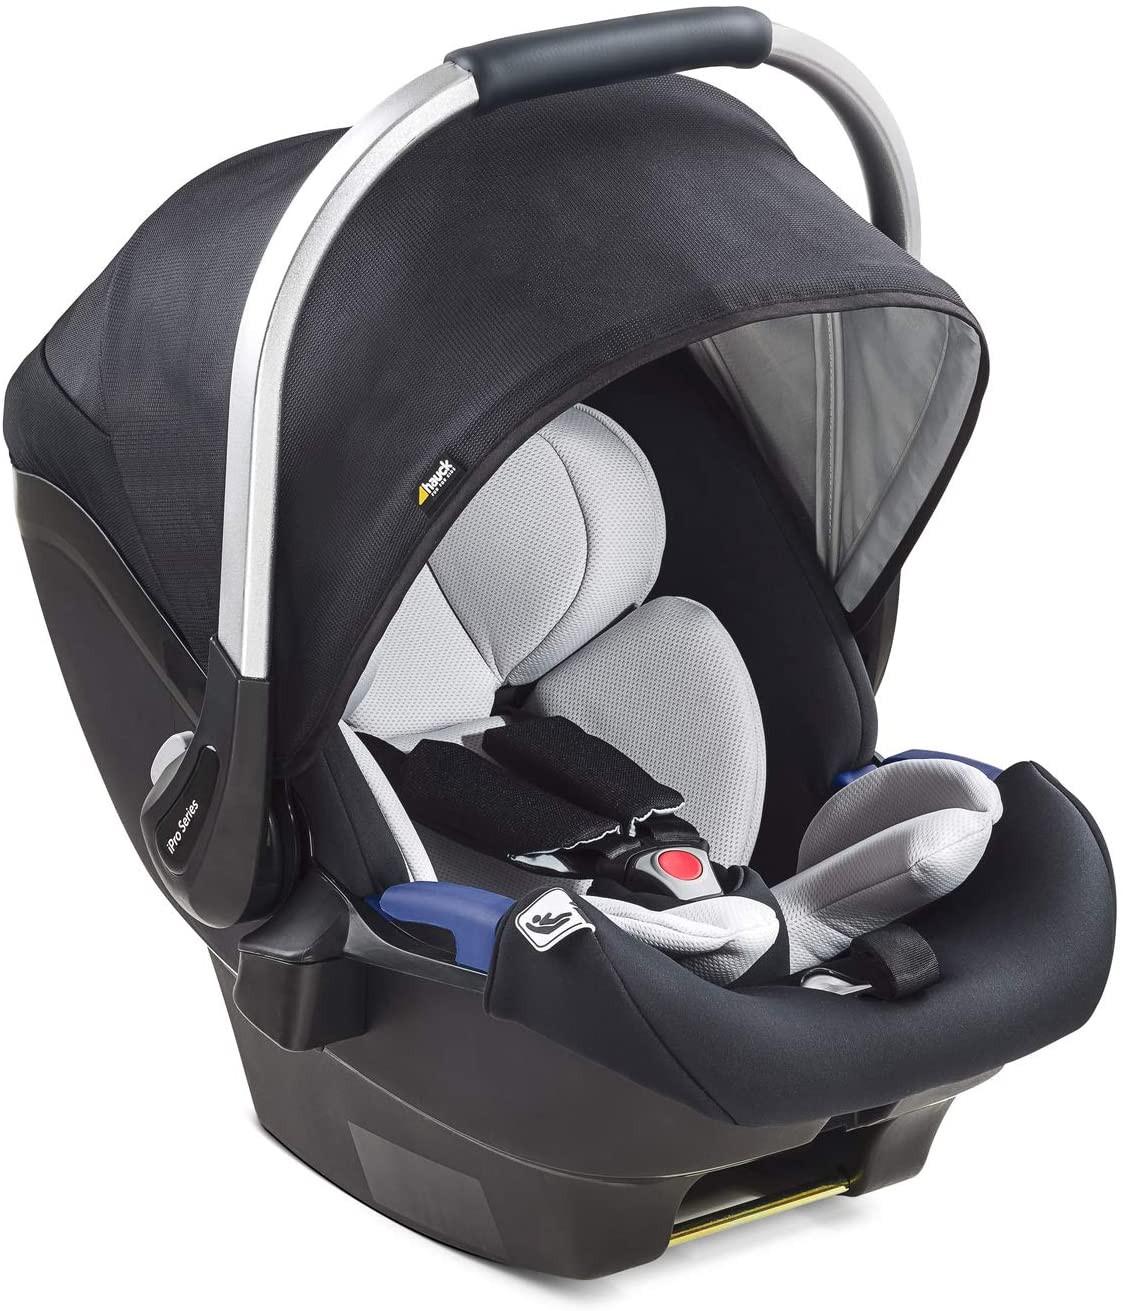 Seggiolino Ipro Baby I-Size Hauck